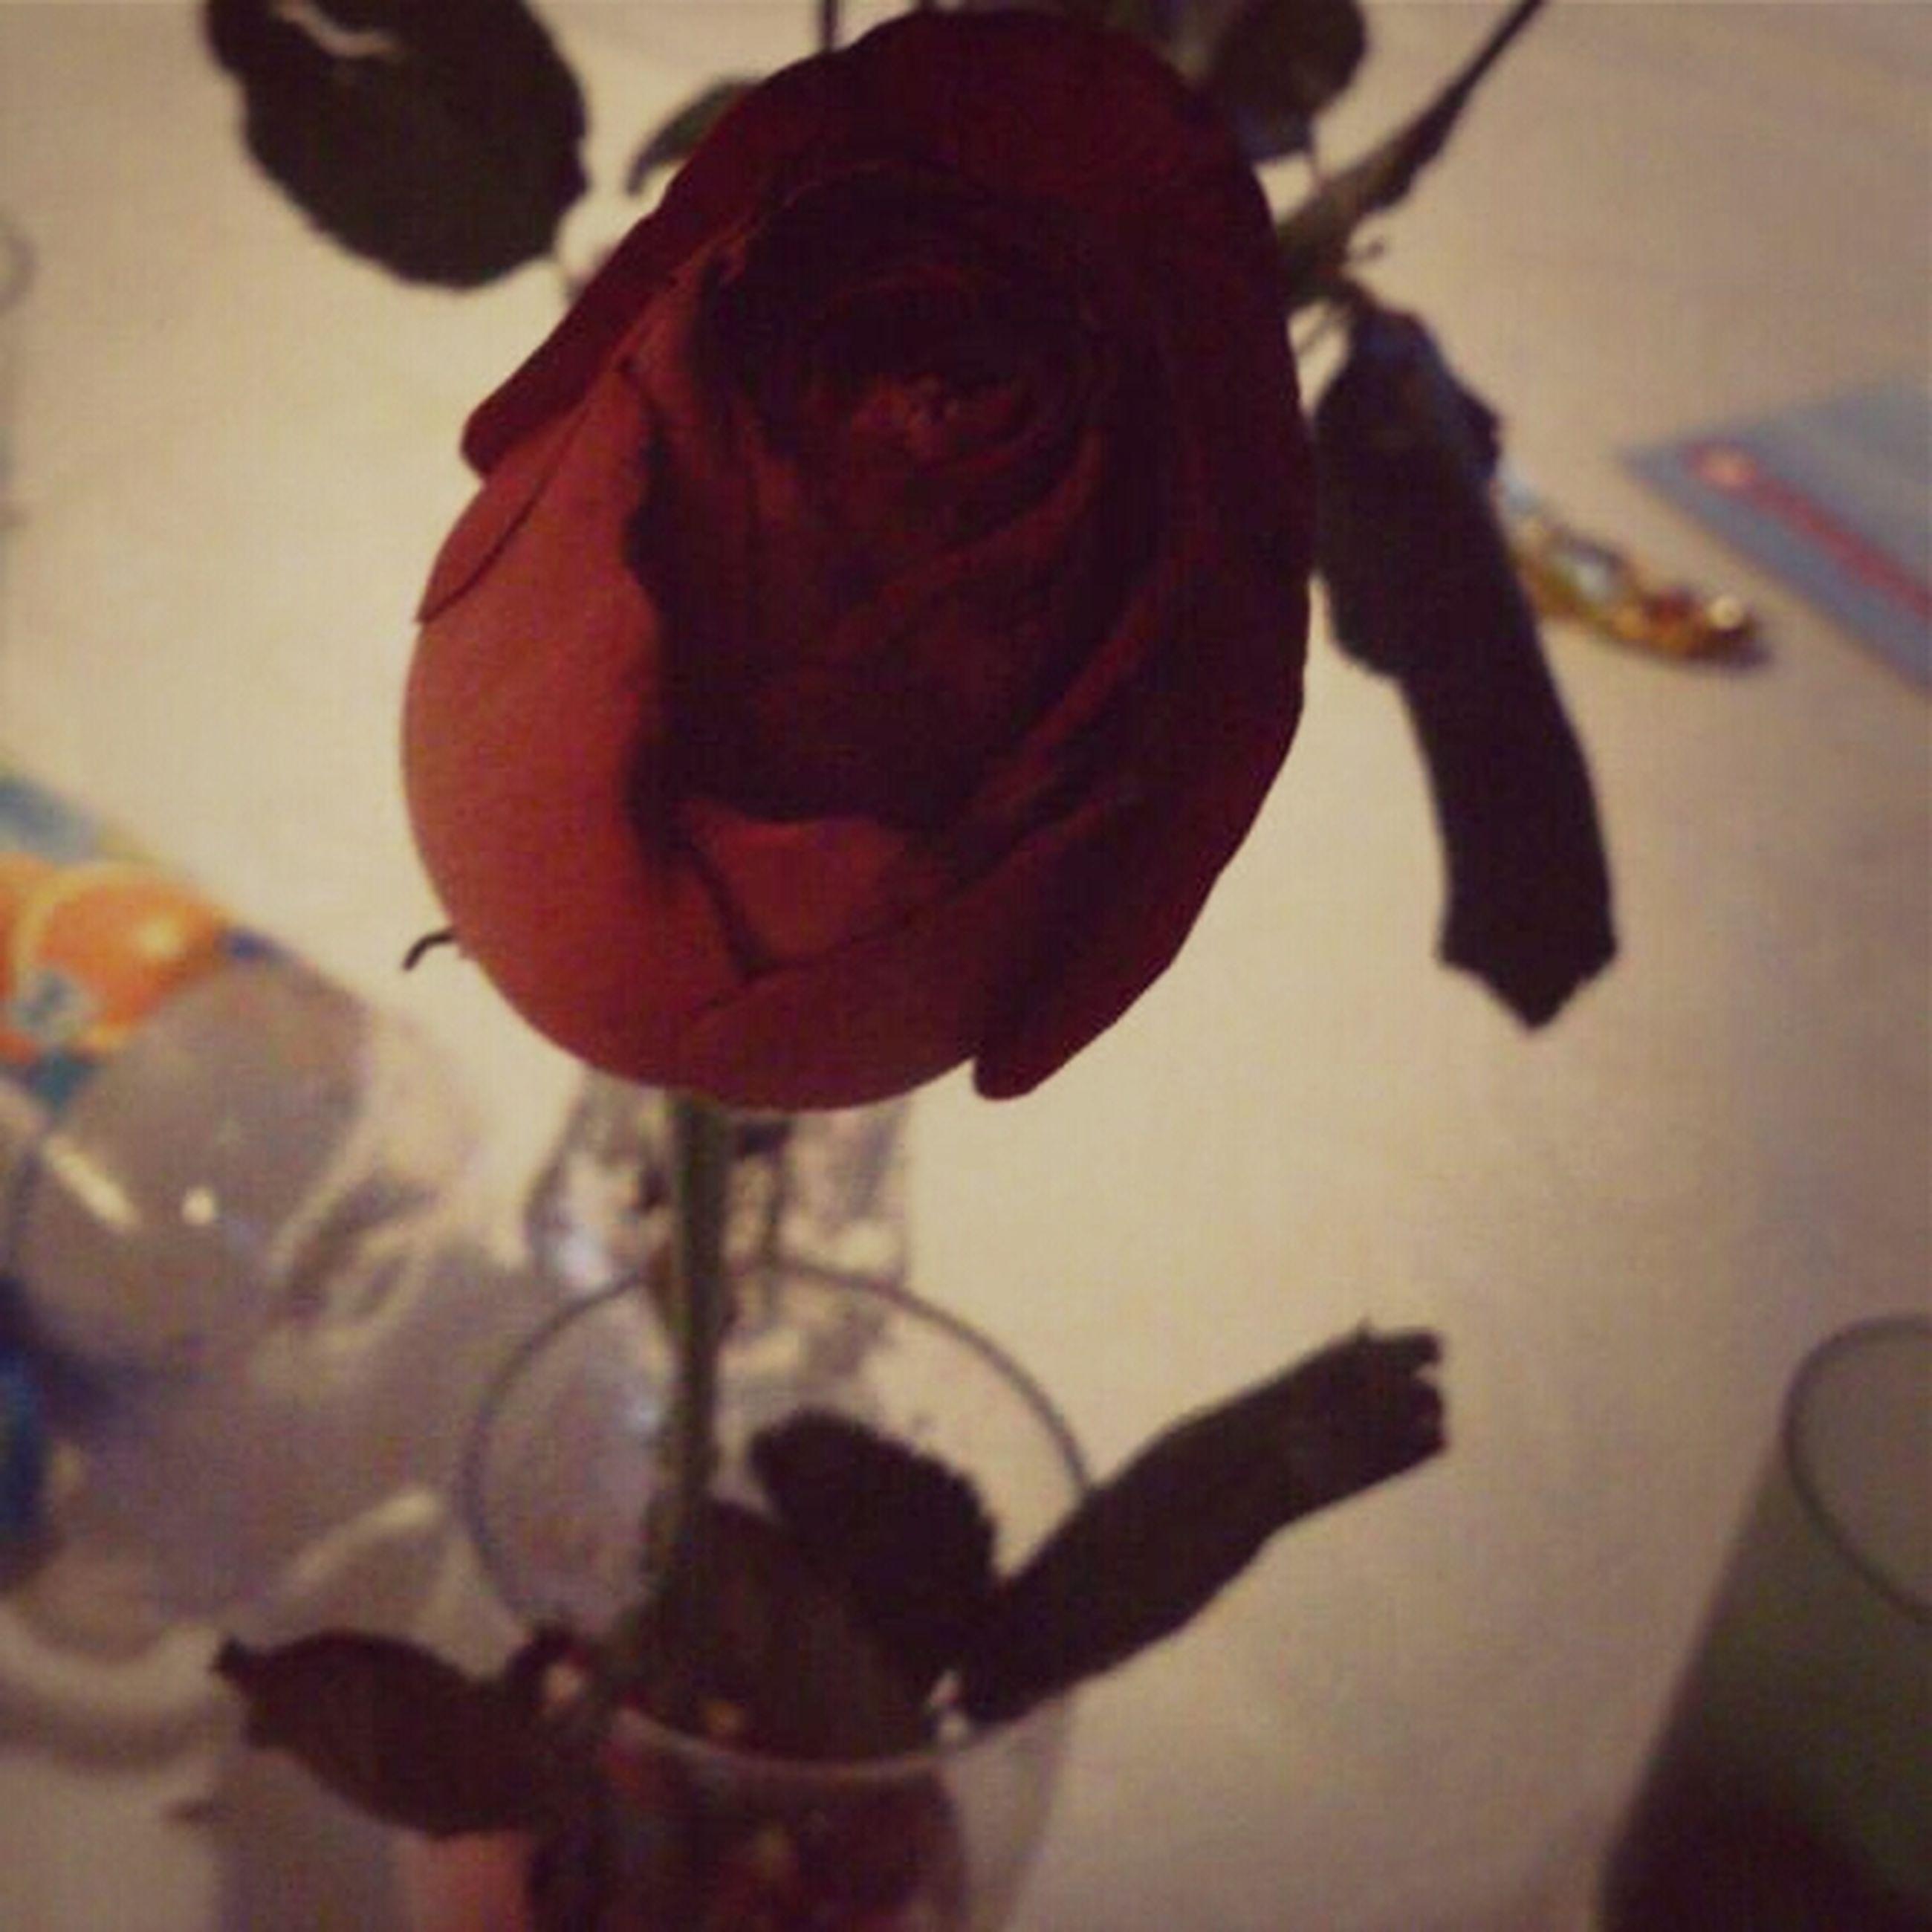 flower, rose - flower, indoors, petal, freshness, close-up, fragility, flower head, rose, focus on foreground, red, single flower, vase, pink color, home interior, no people, nature, table, plant, stem